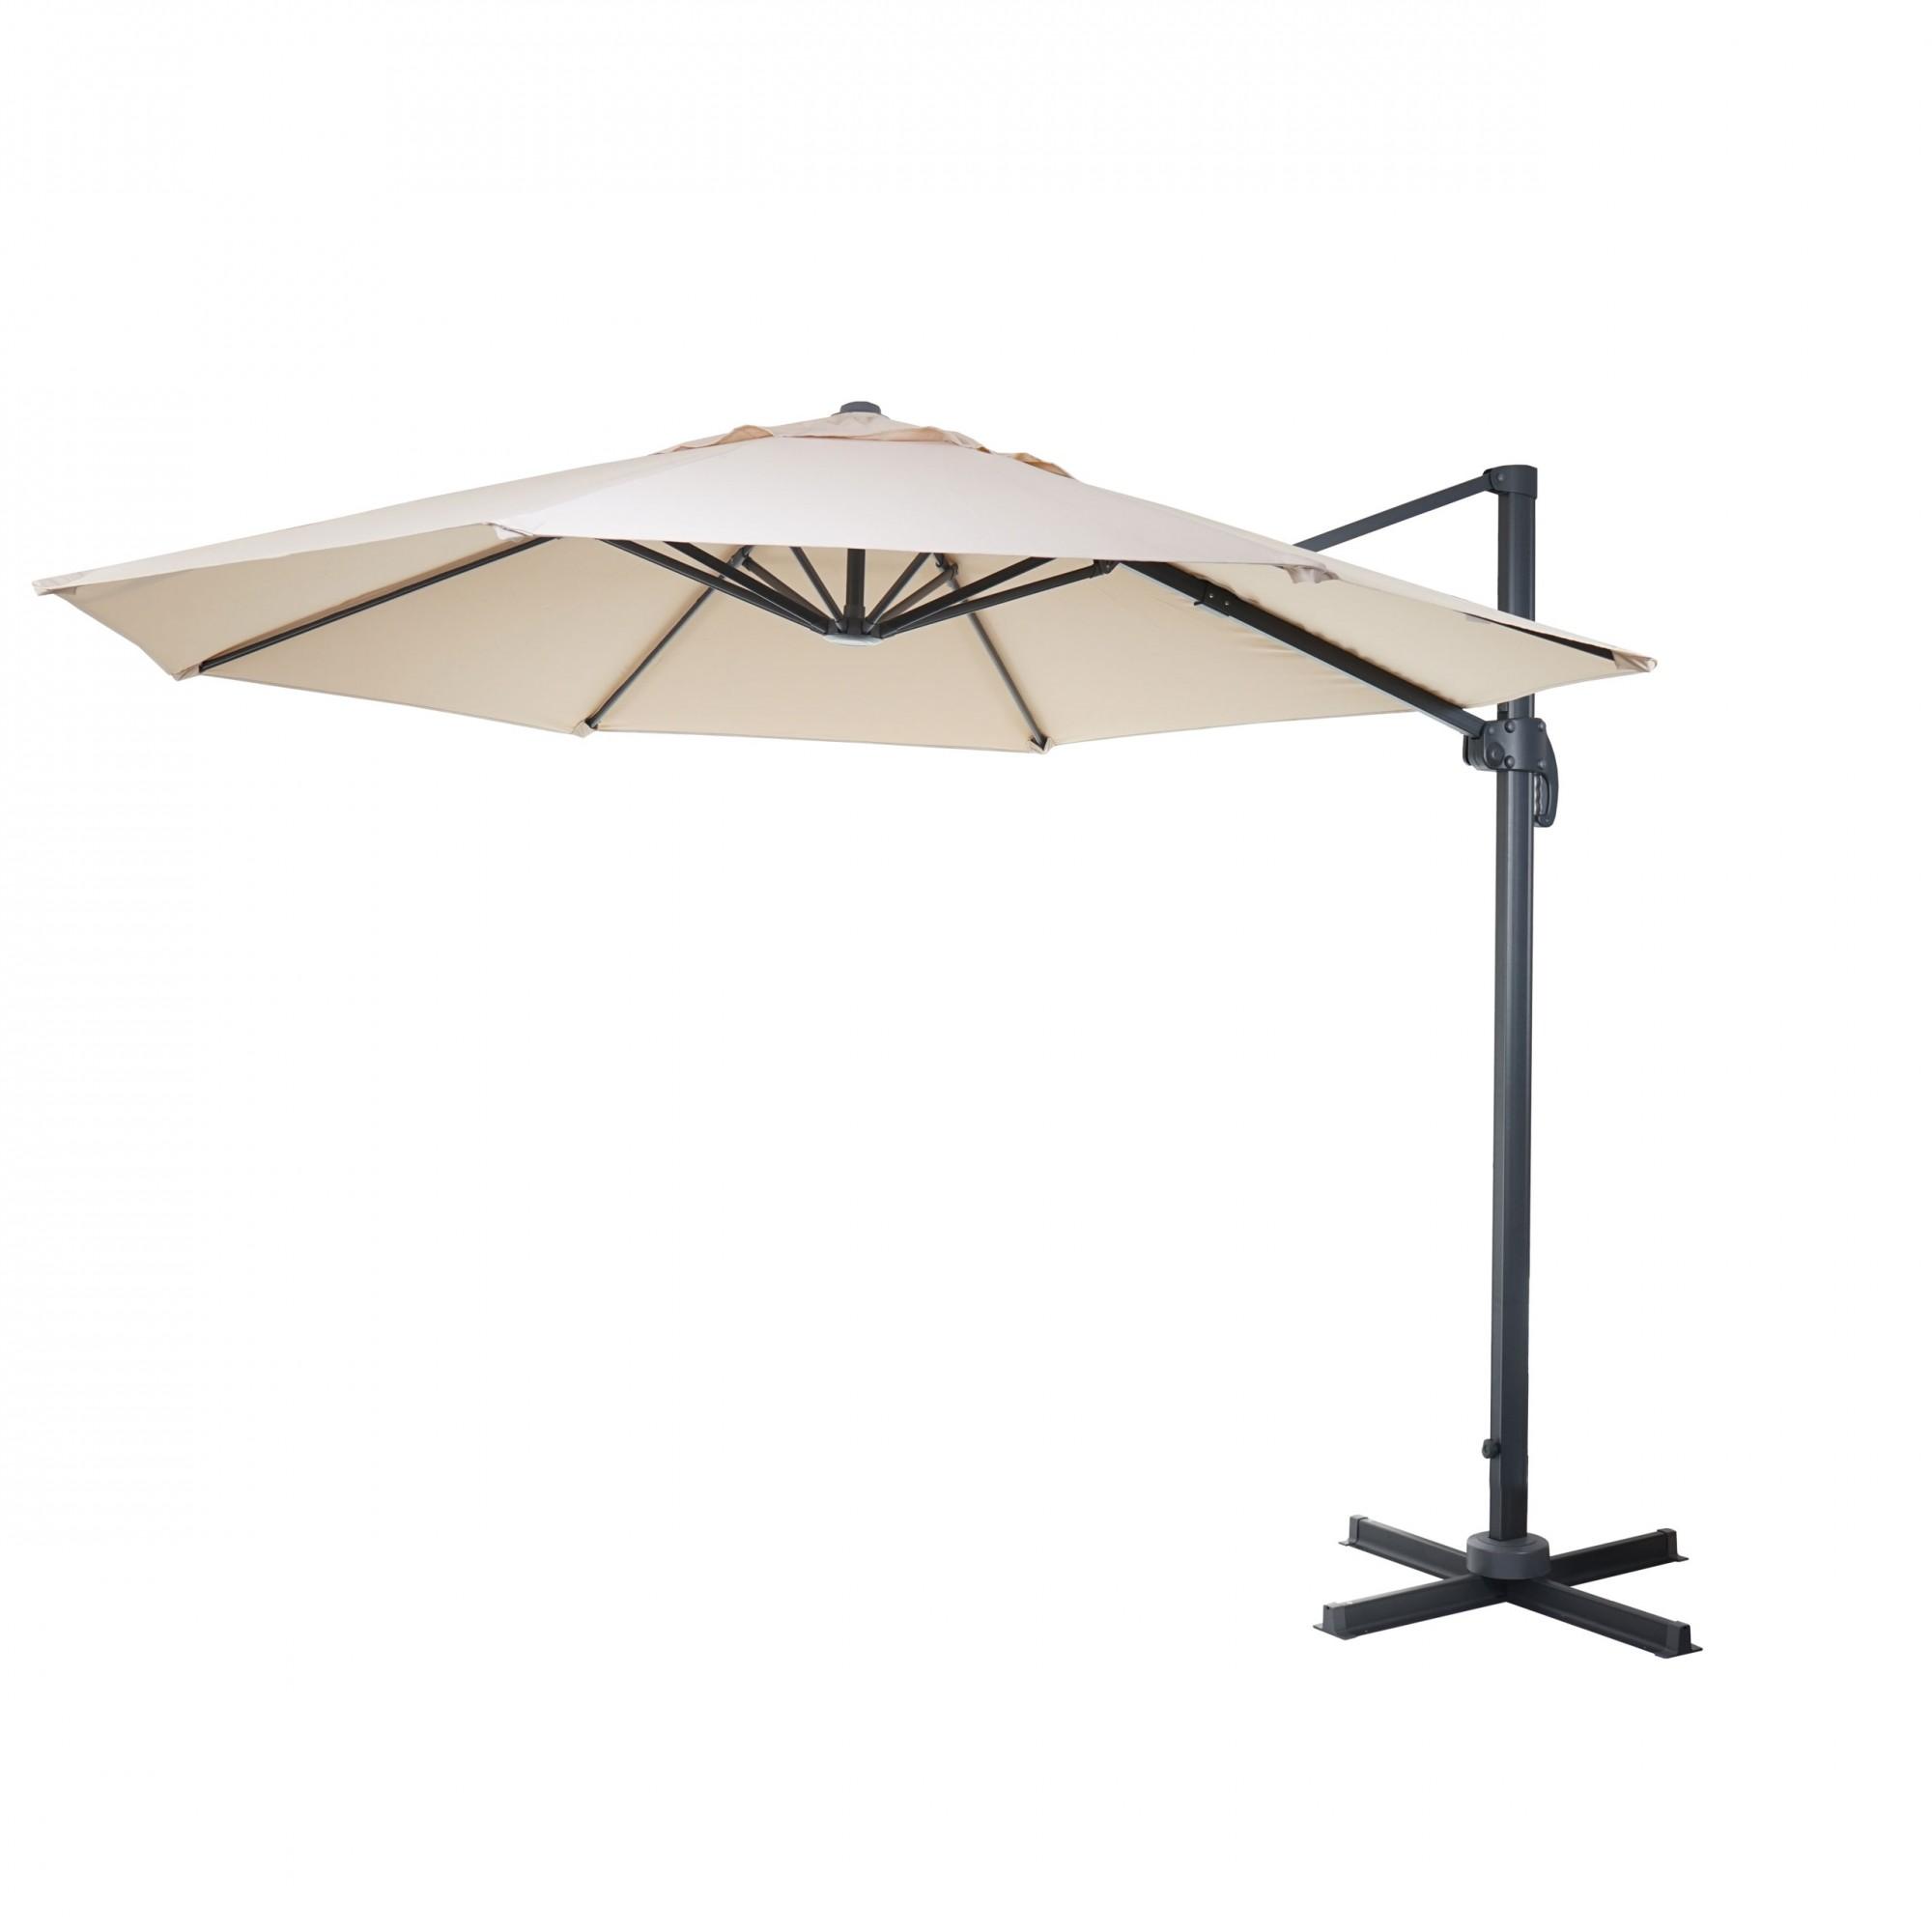 gastronomie luxus ampelschirm sonnenschirm 4m garten. Black Bedroom Furniture Sets. Home Design Ideas